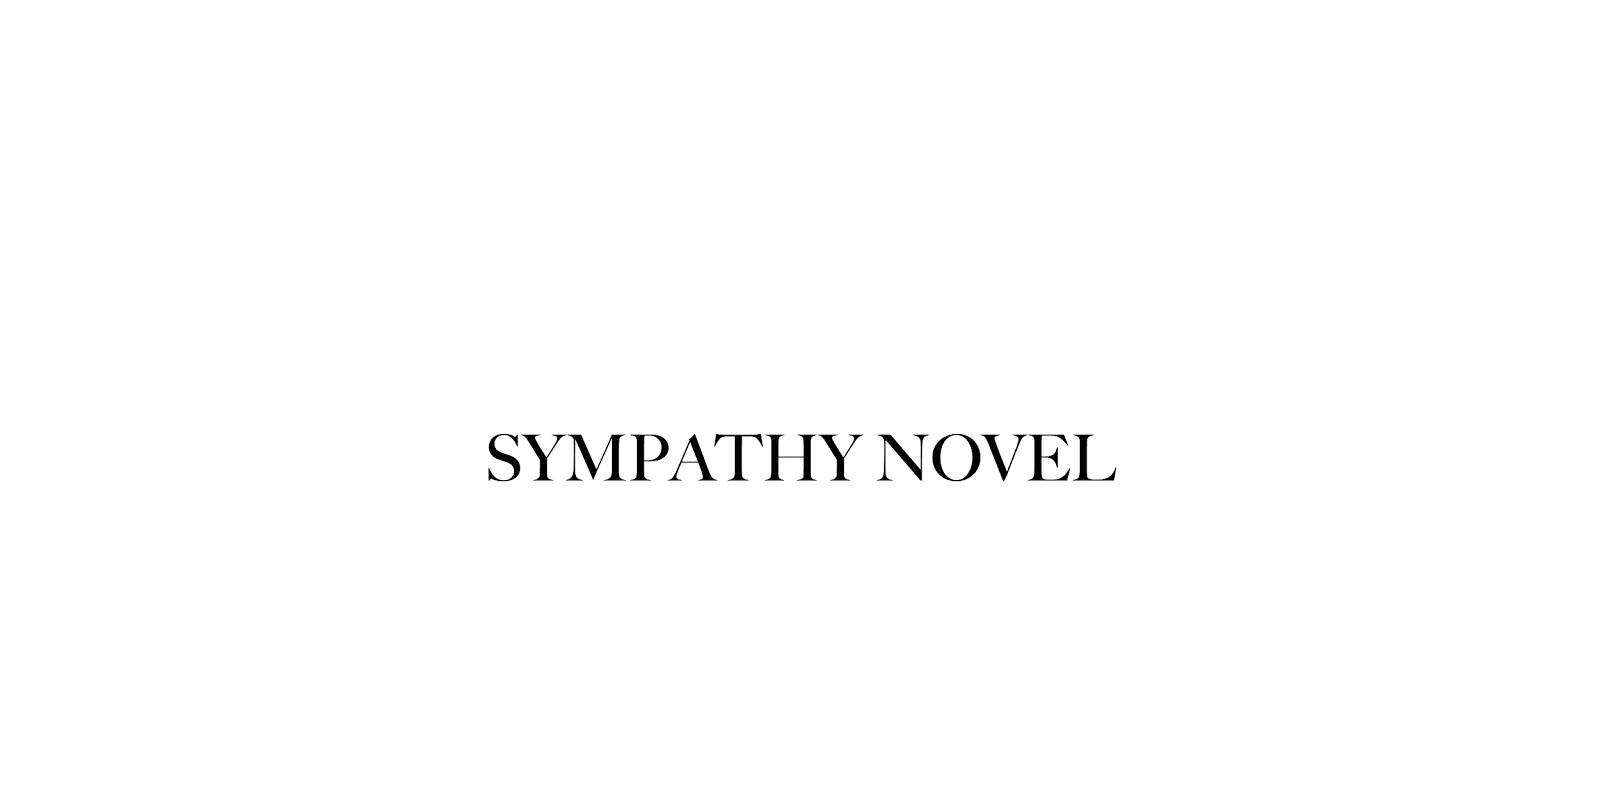 Sympathy Novel